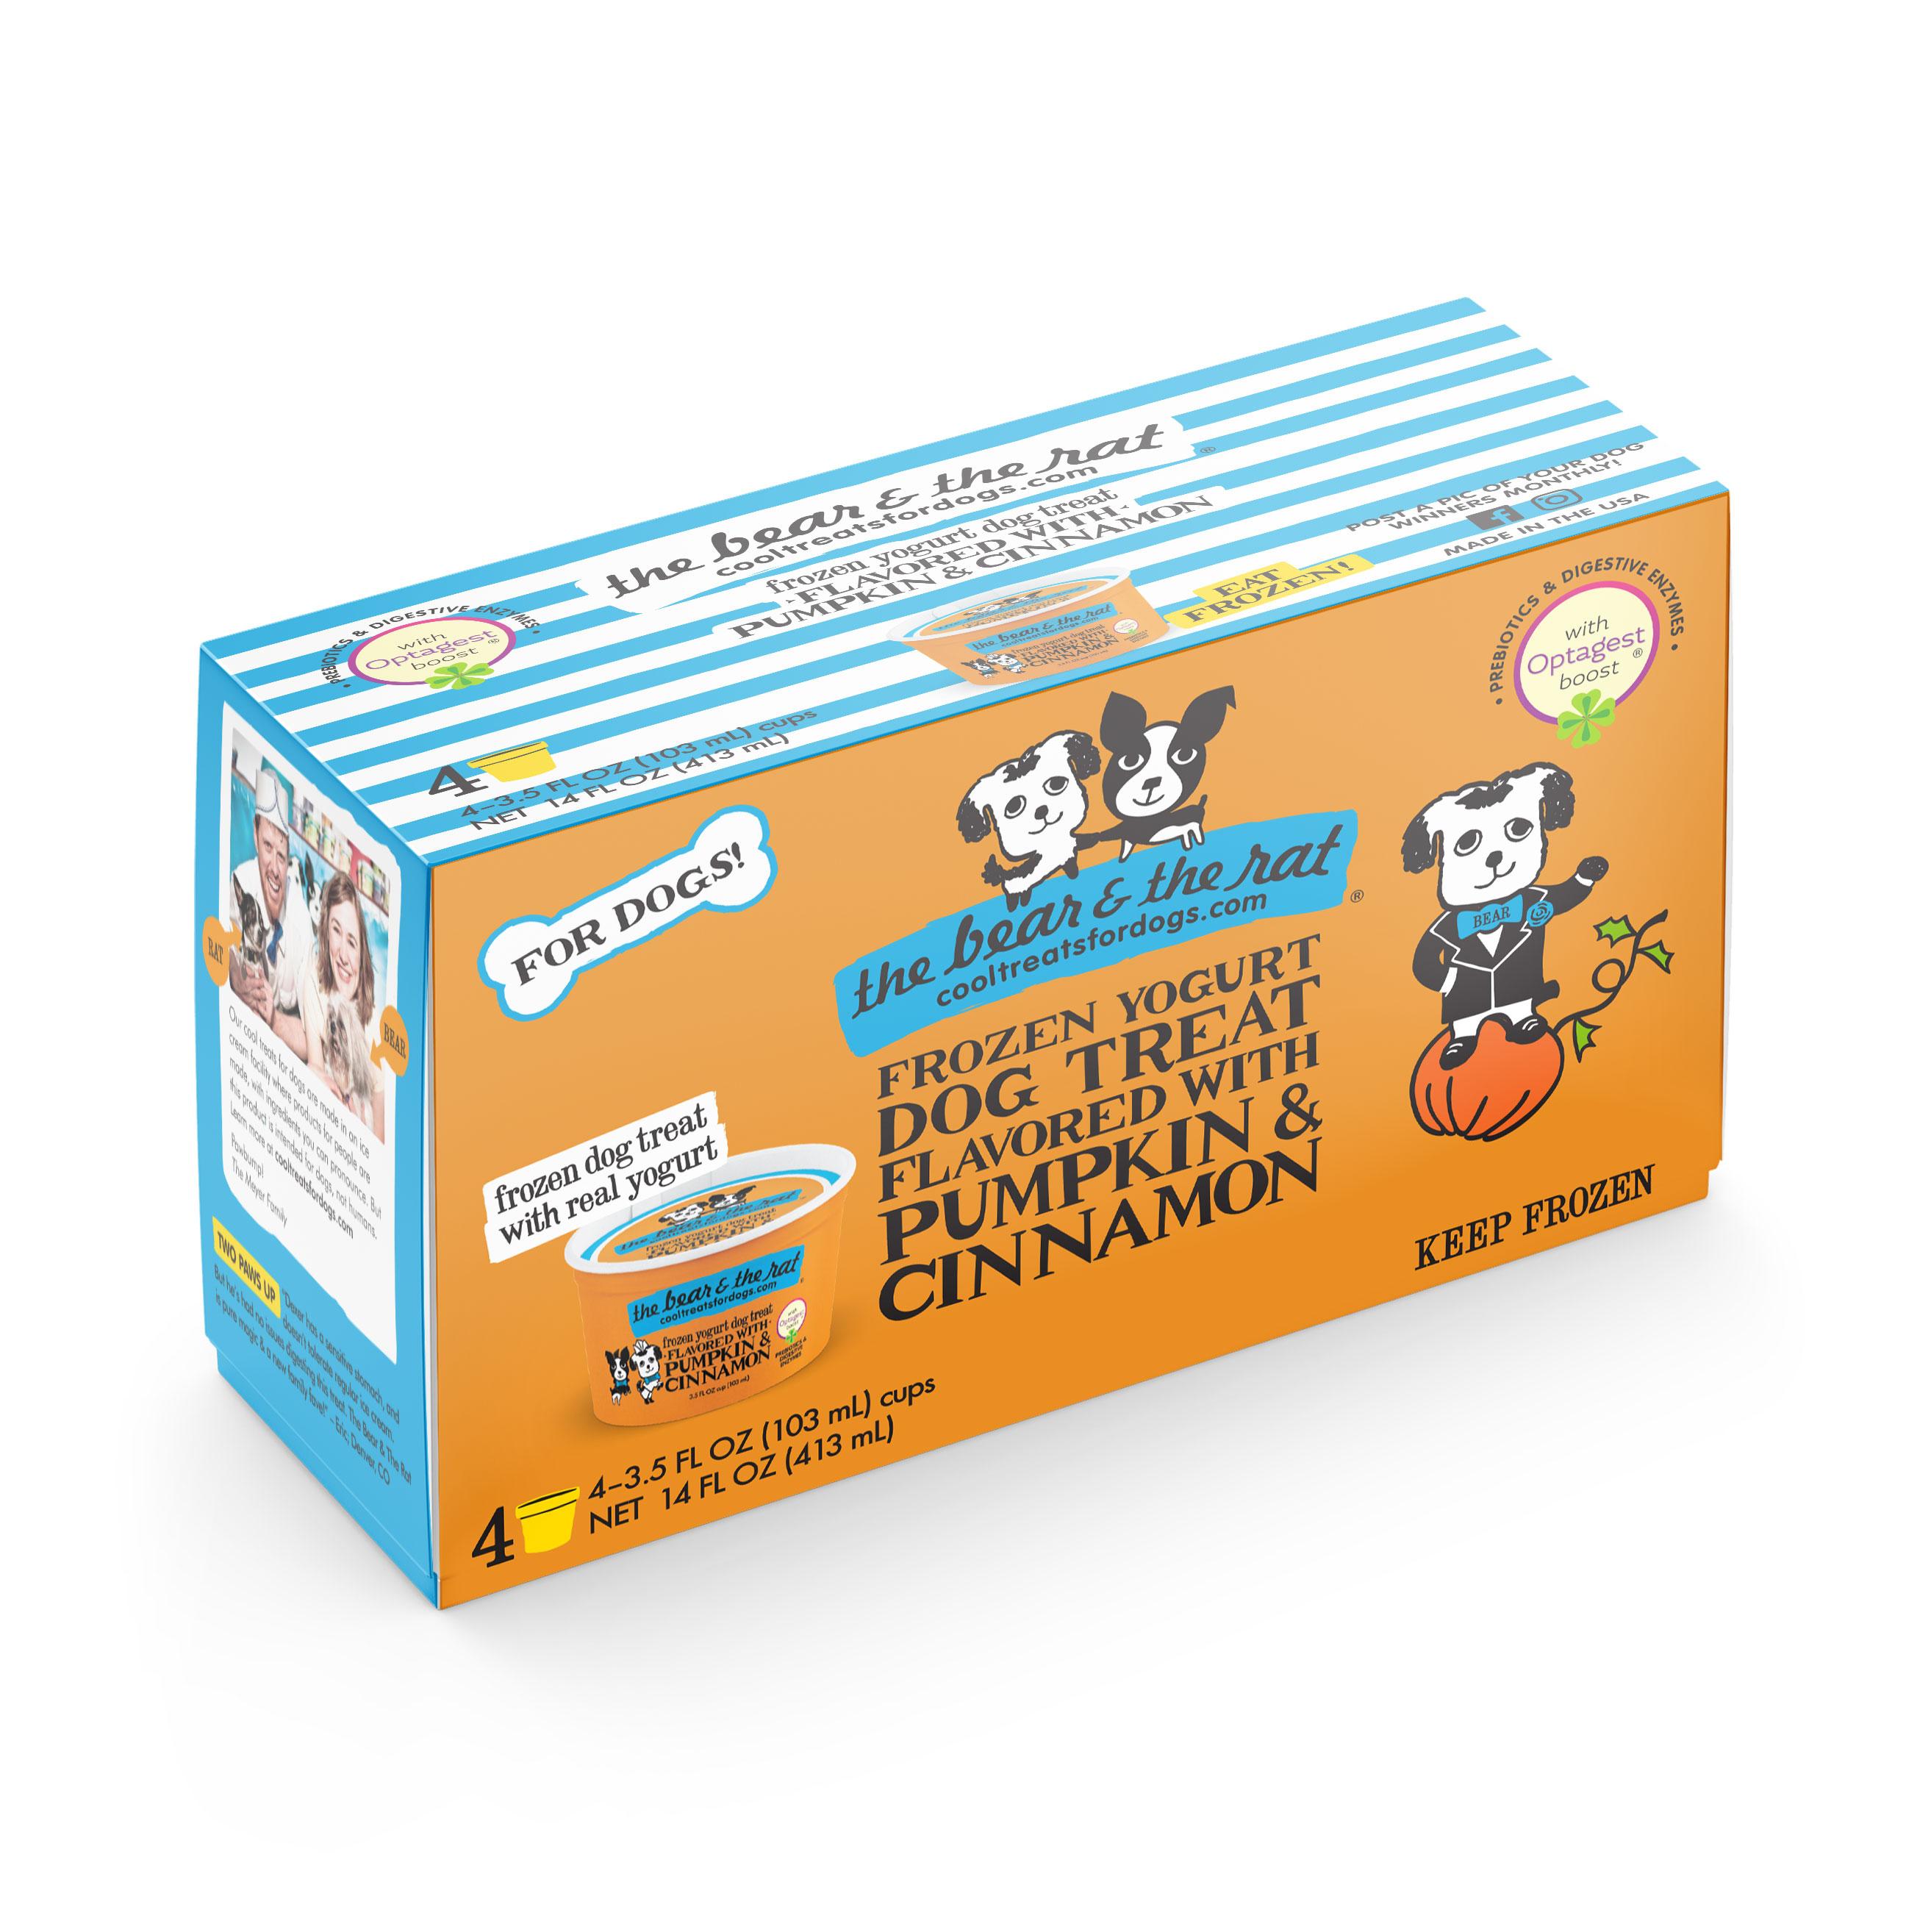 The Bear & The Rat Pumpkin & Cinnamon Frozen Yogurt Dog Treats, 3.5-oz, 4-pack